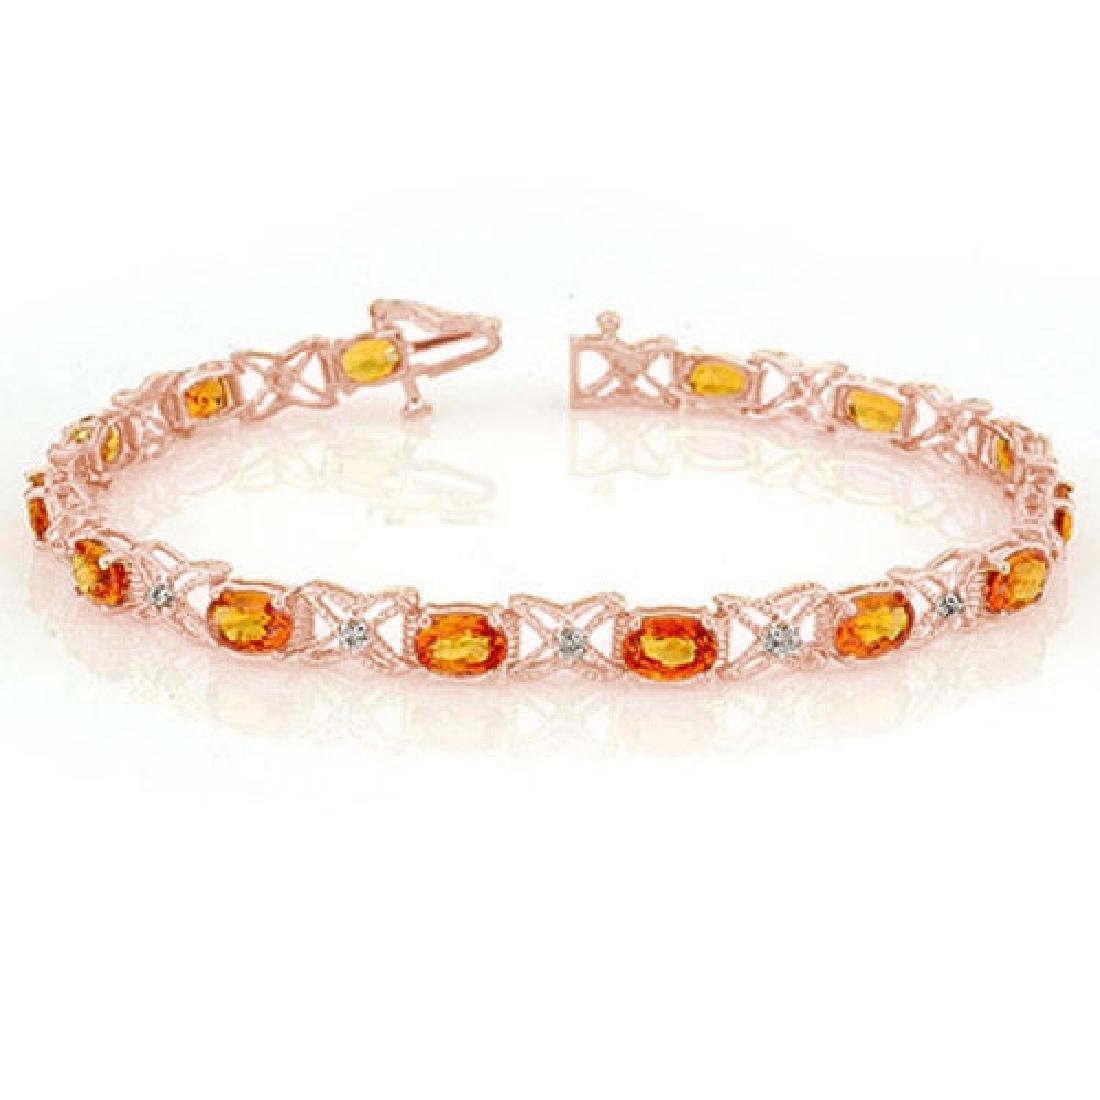 10.15 CTW Orange Sapphire & Diamond Bracelet 18K Rose